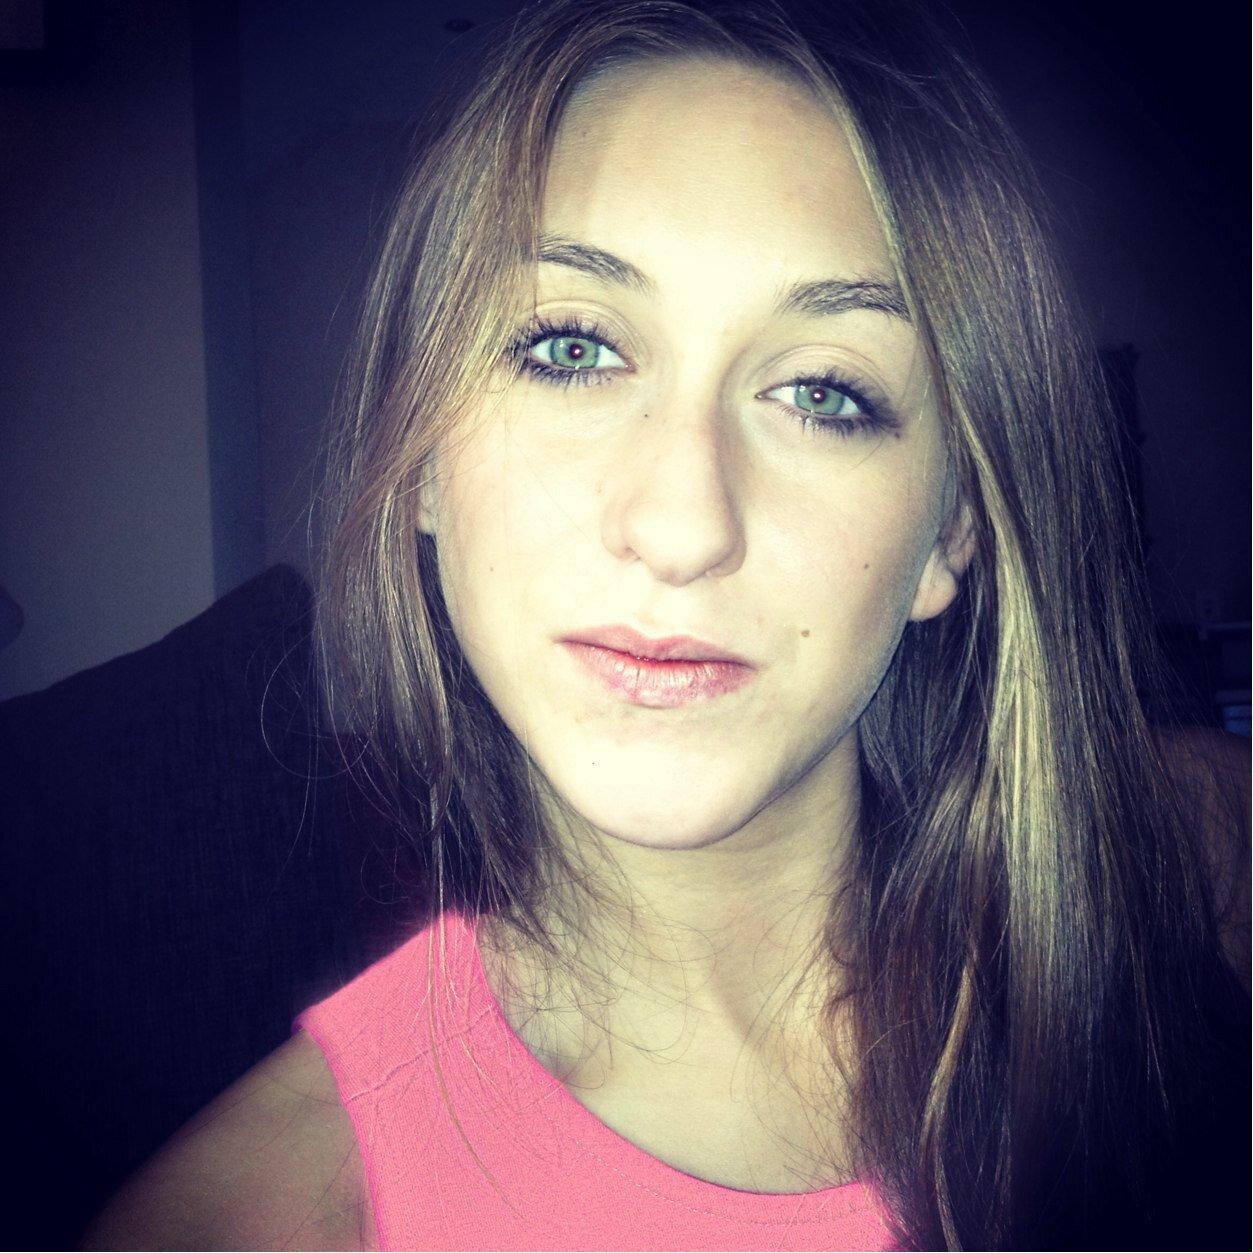 Kate Serjeantson,Buddug Williams Hot clips Lucy Hale born June 14, 1989 (age 29),Charity Shea